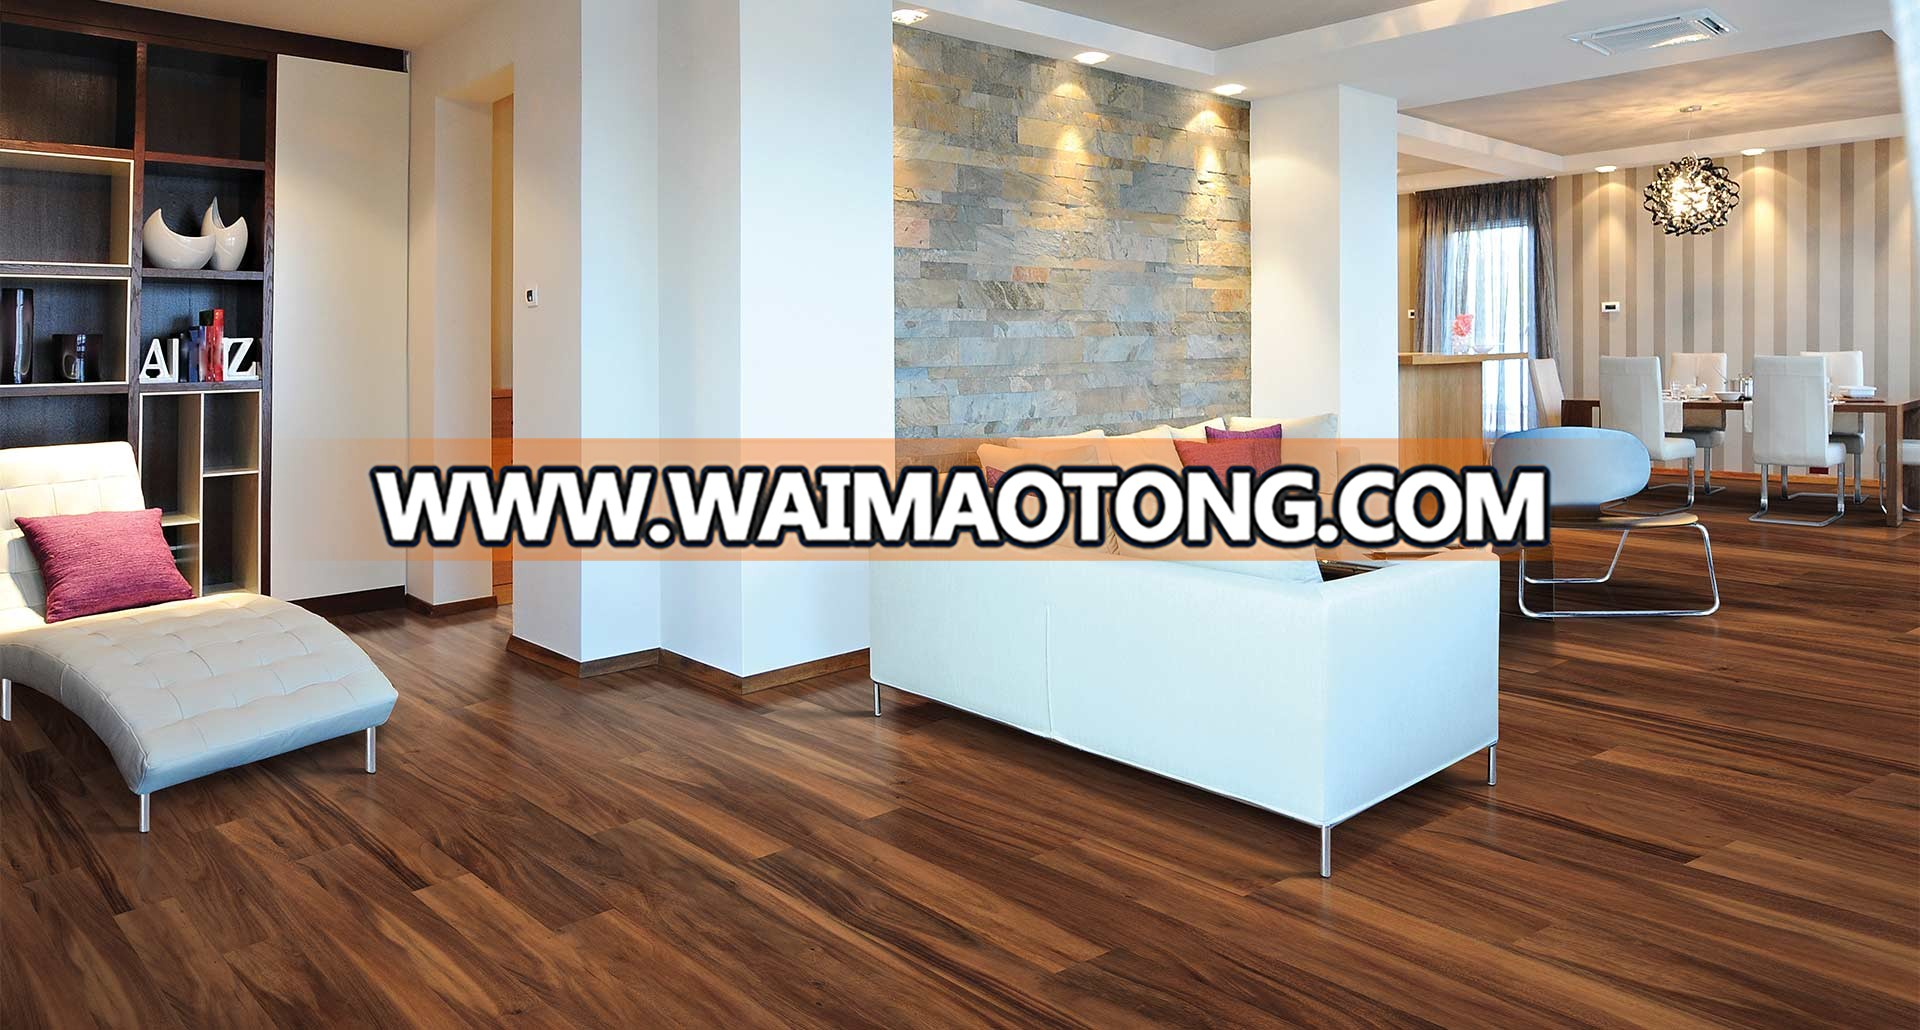 Top Quality swiftlock handscraped hickory laminate flooring